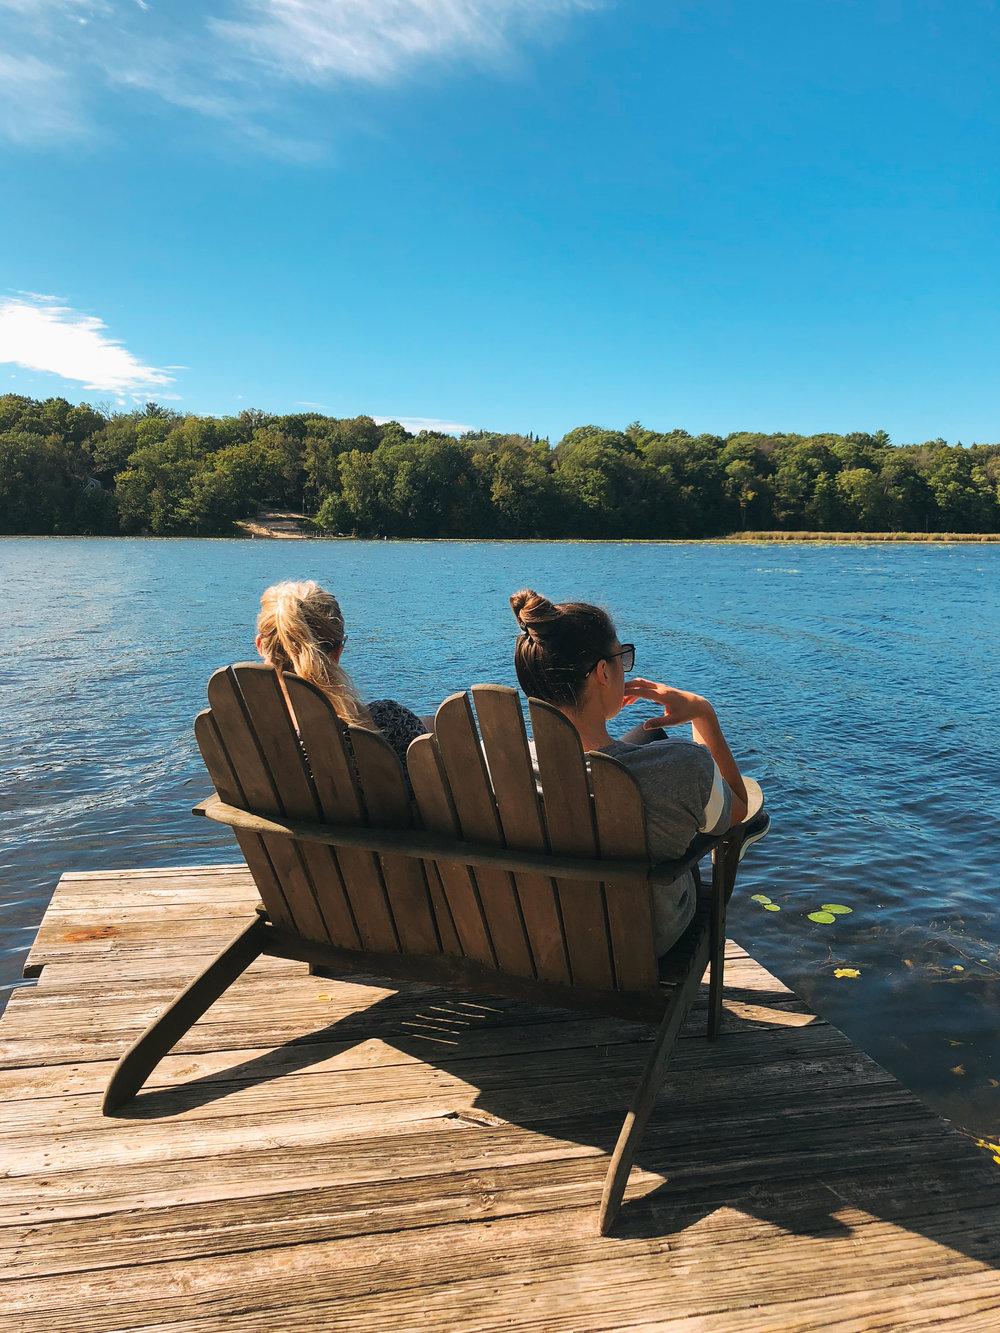 boat_dock_sisters_wisconsin.jpg